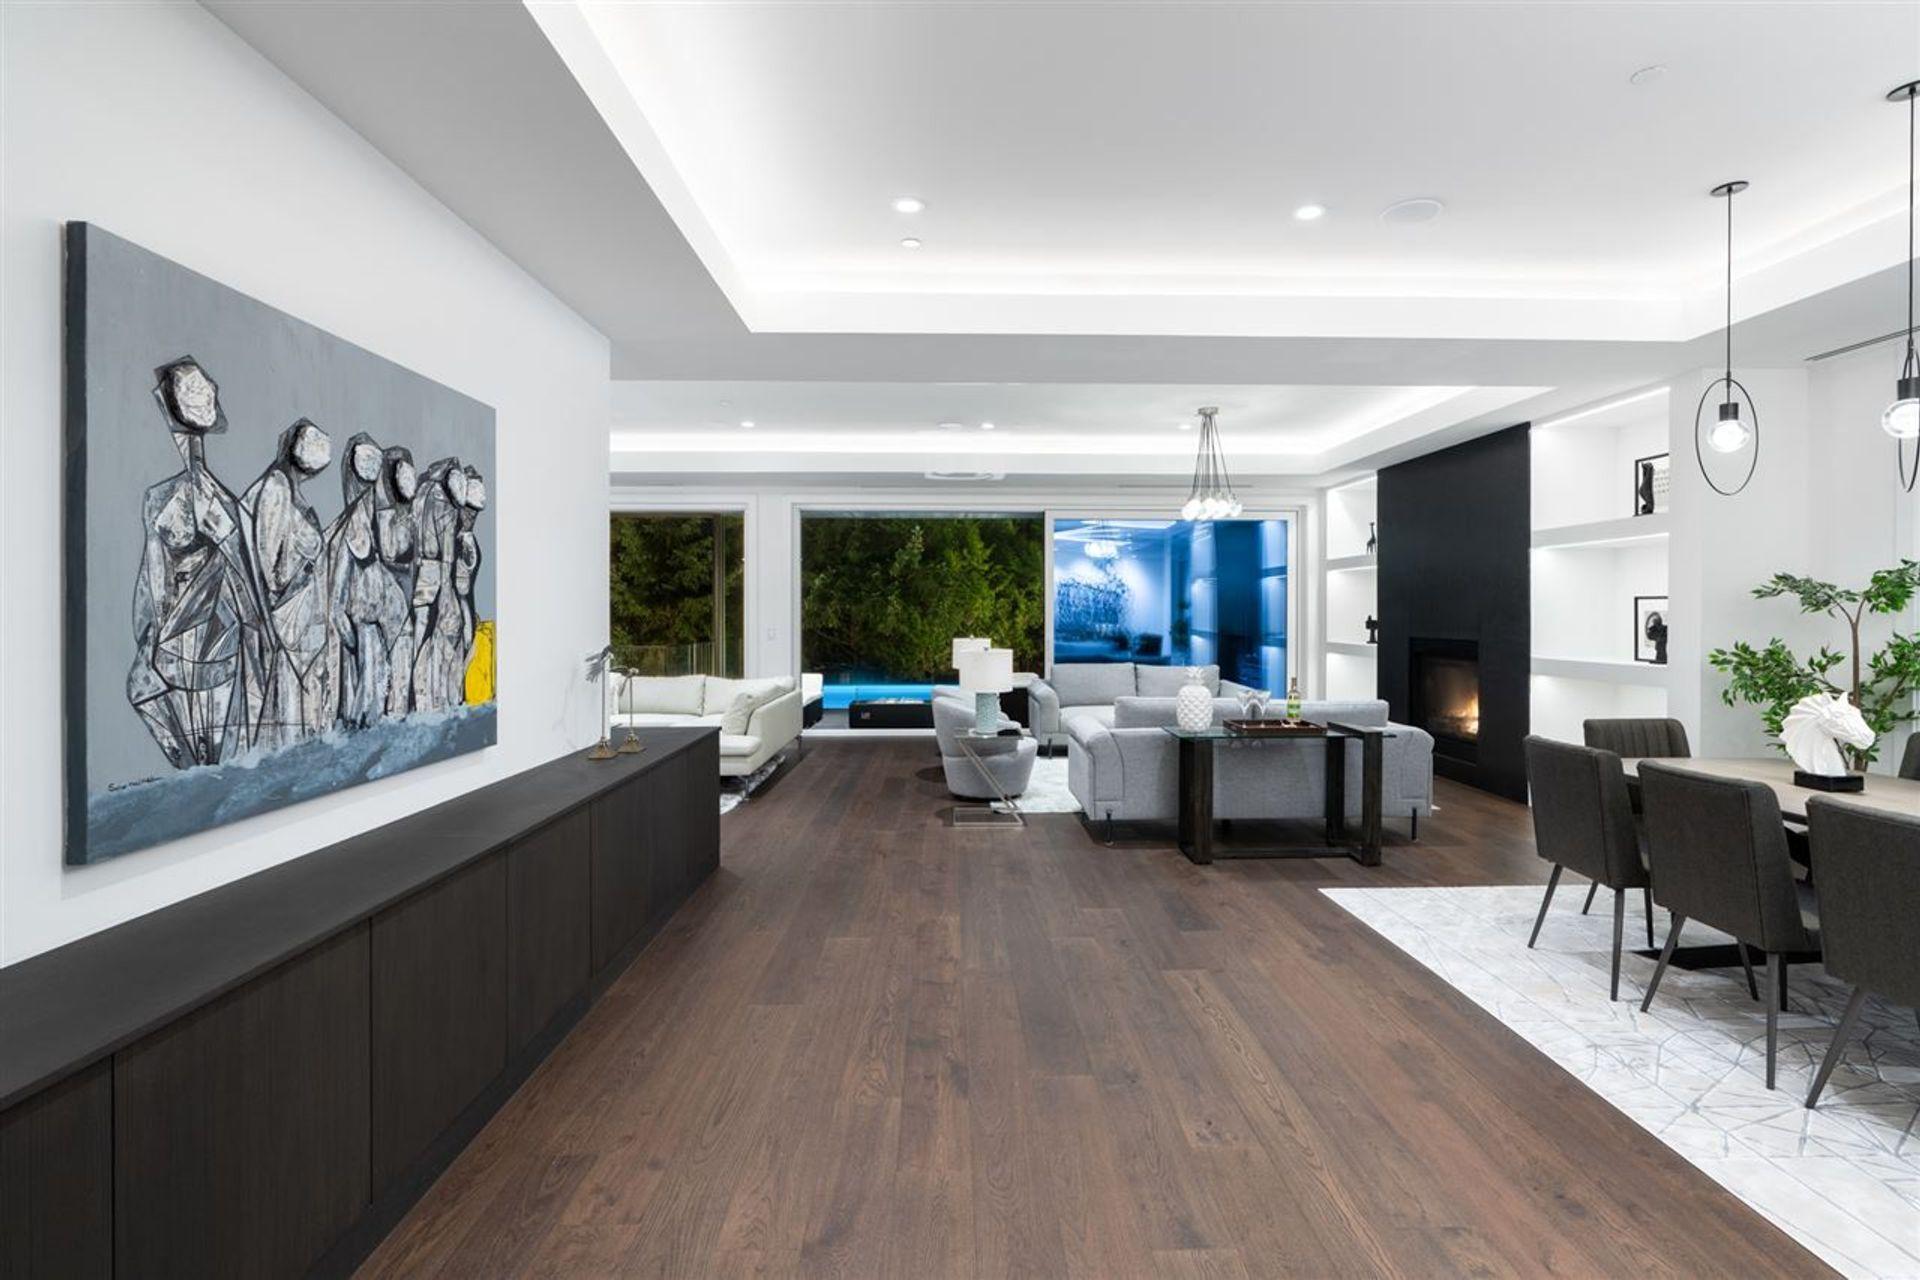 1040-wildwood-lane-british-properties-west-vancouver-08 at 1040 Wildwood Lane, British Properties, West Vancouver